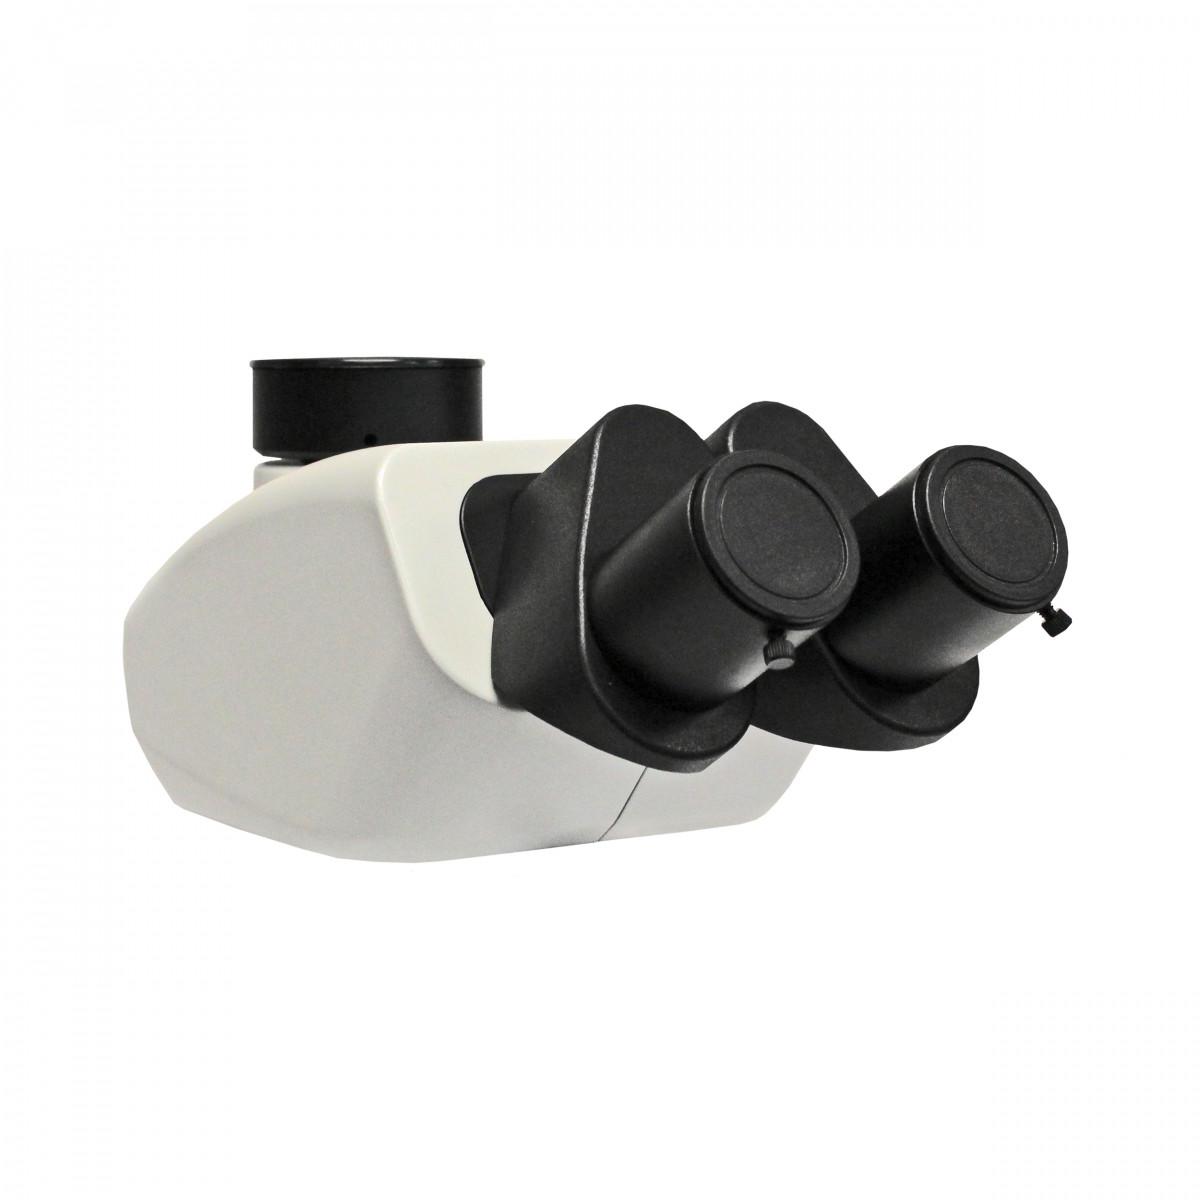 112-11-02-Trinocular Viewing Head - Z12 Series - Left Side View